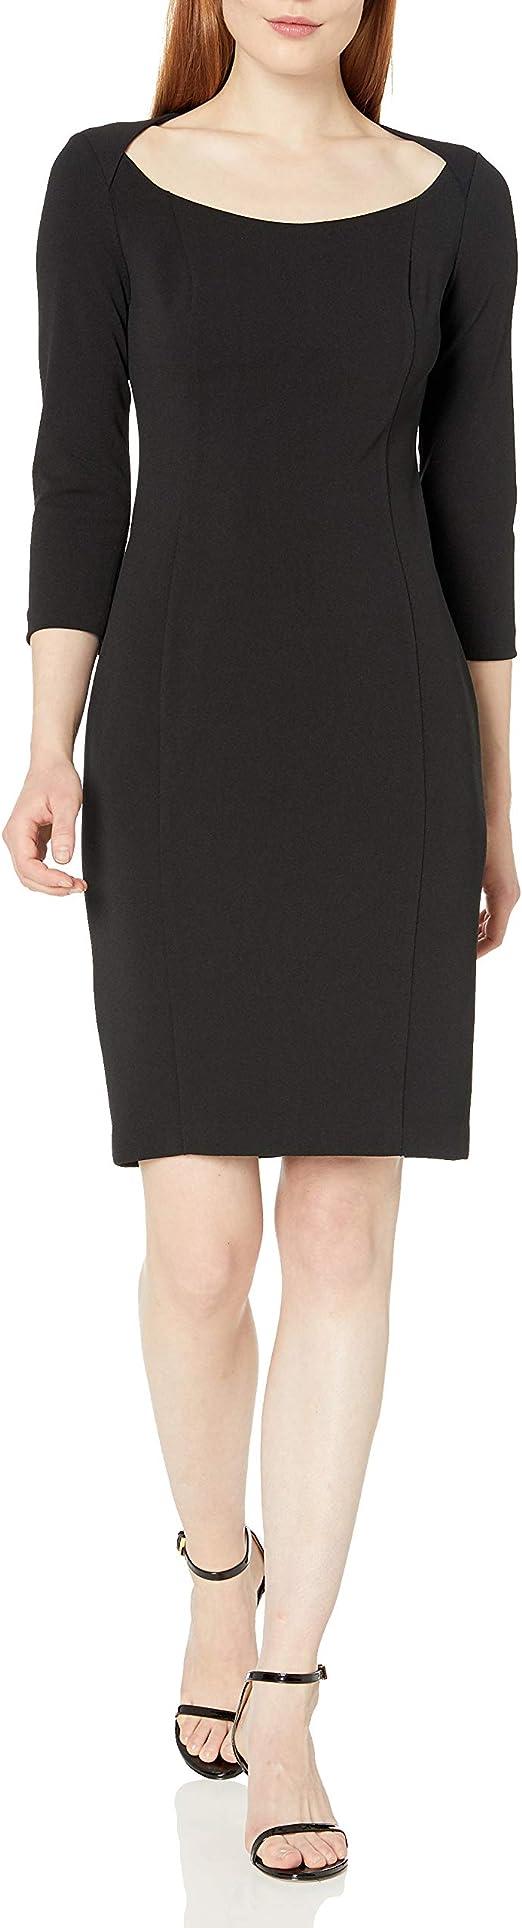 Calvin Klein 卡尔文克莱因 CK 七分袖 大开领女式连衣裙 2.7折$35.72 海淘转运到手约¥283